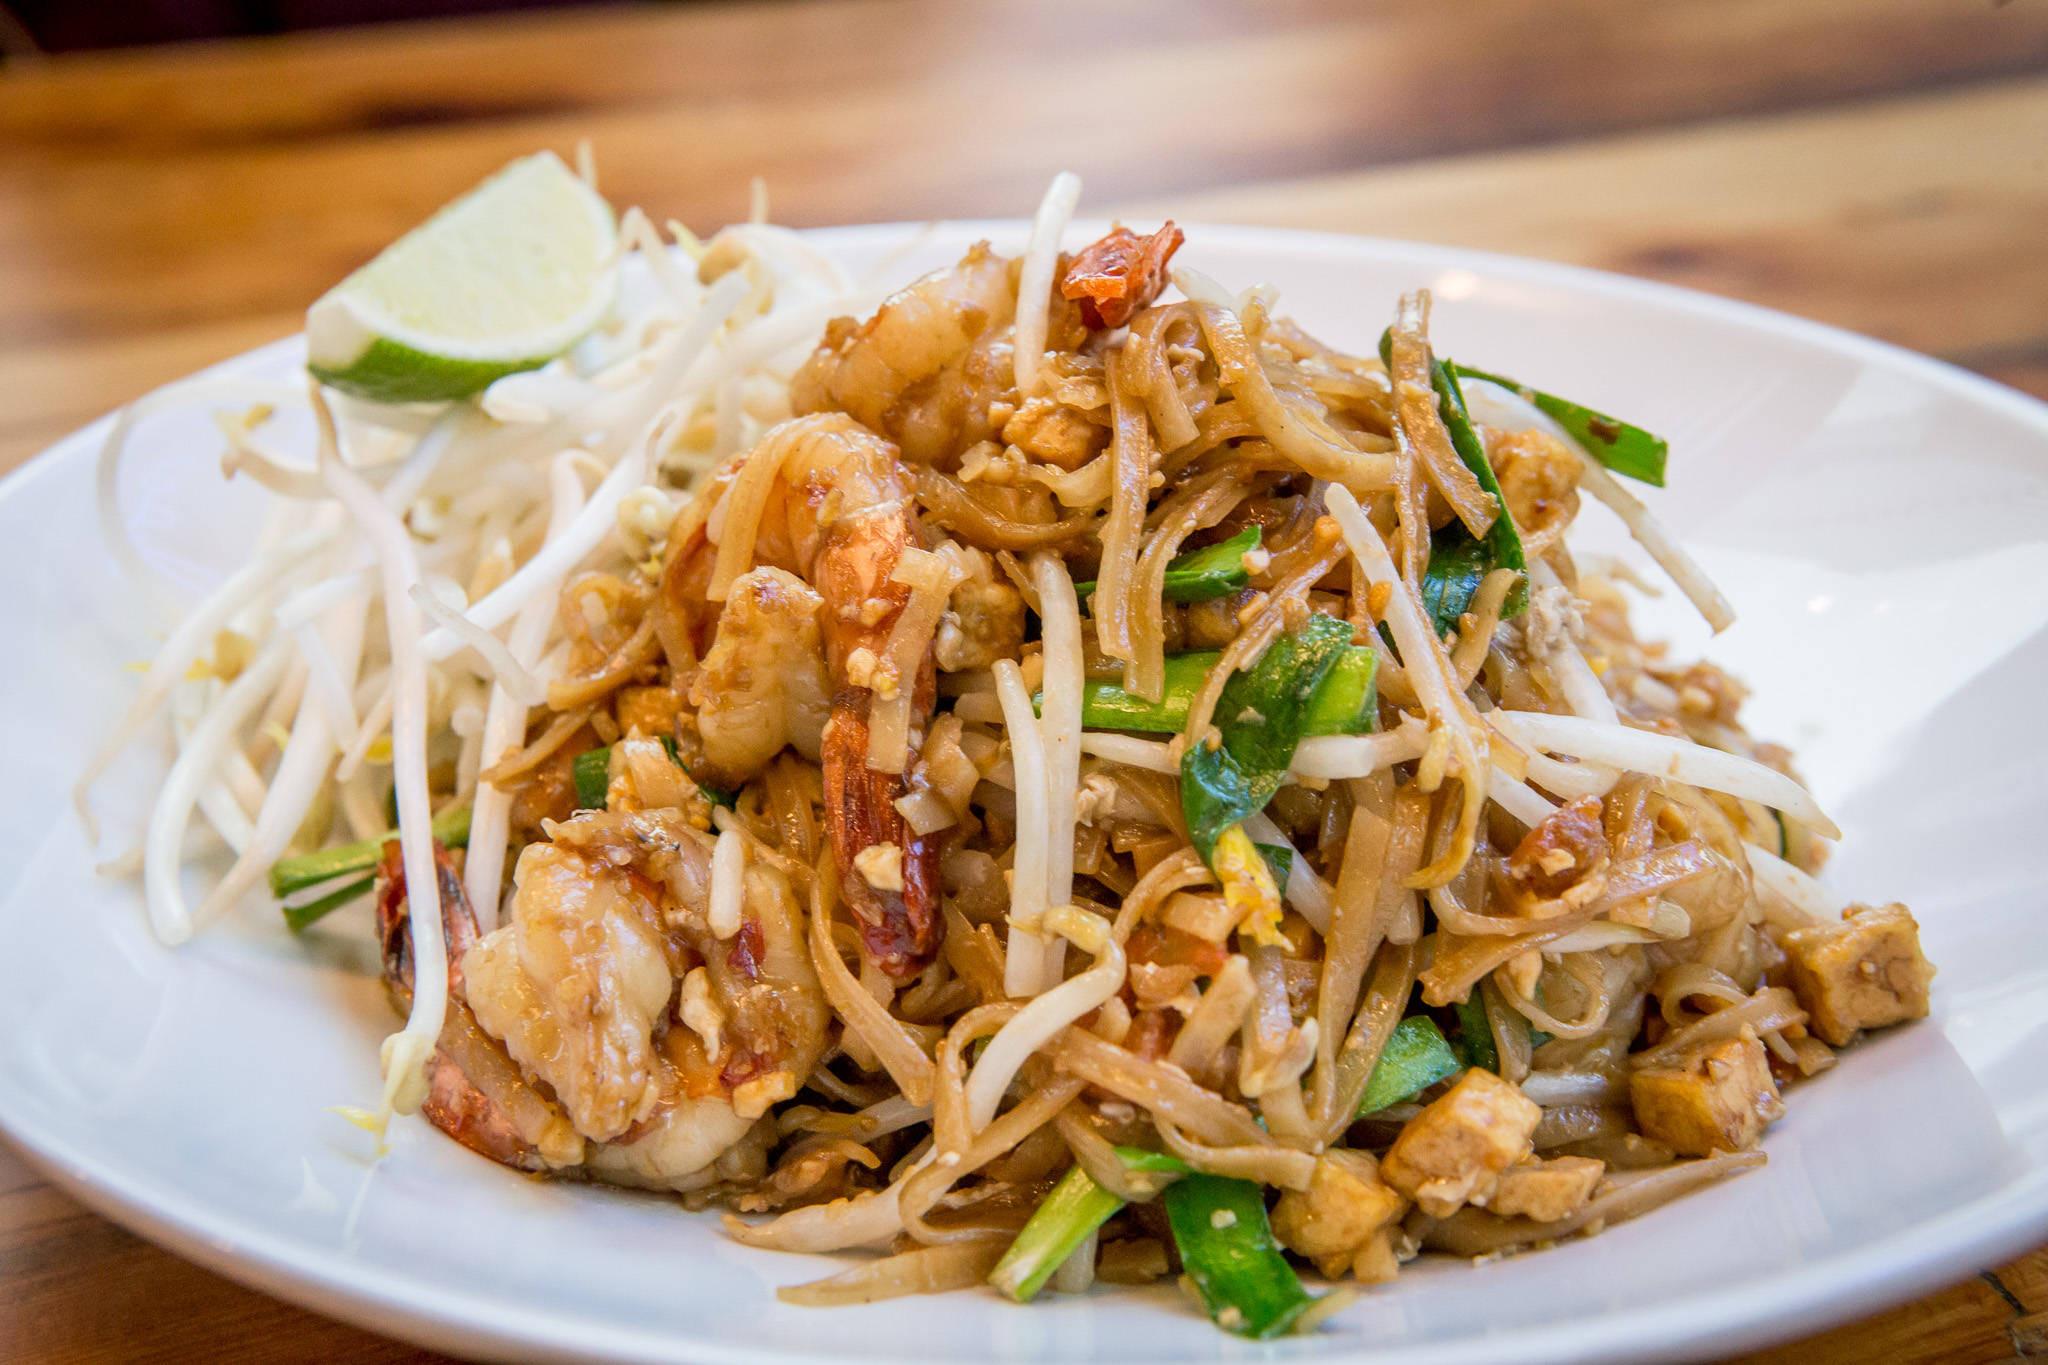 Best Pad Thai  The Best Pad Thai in Toronto